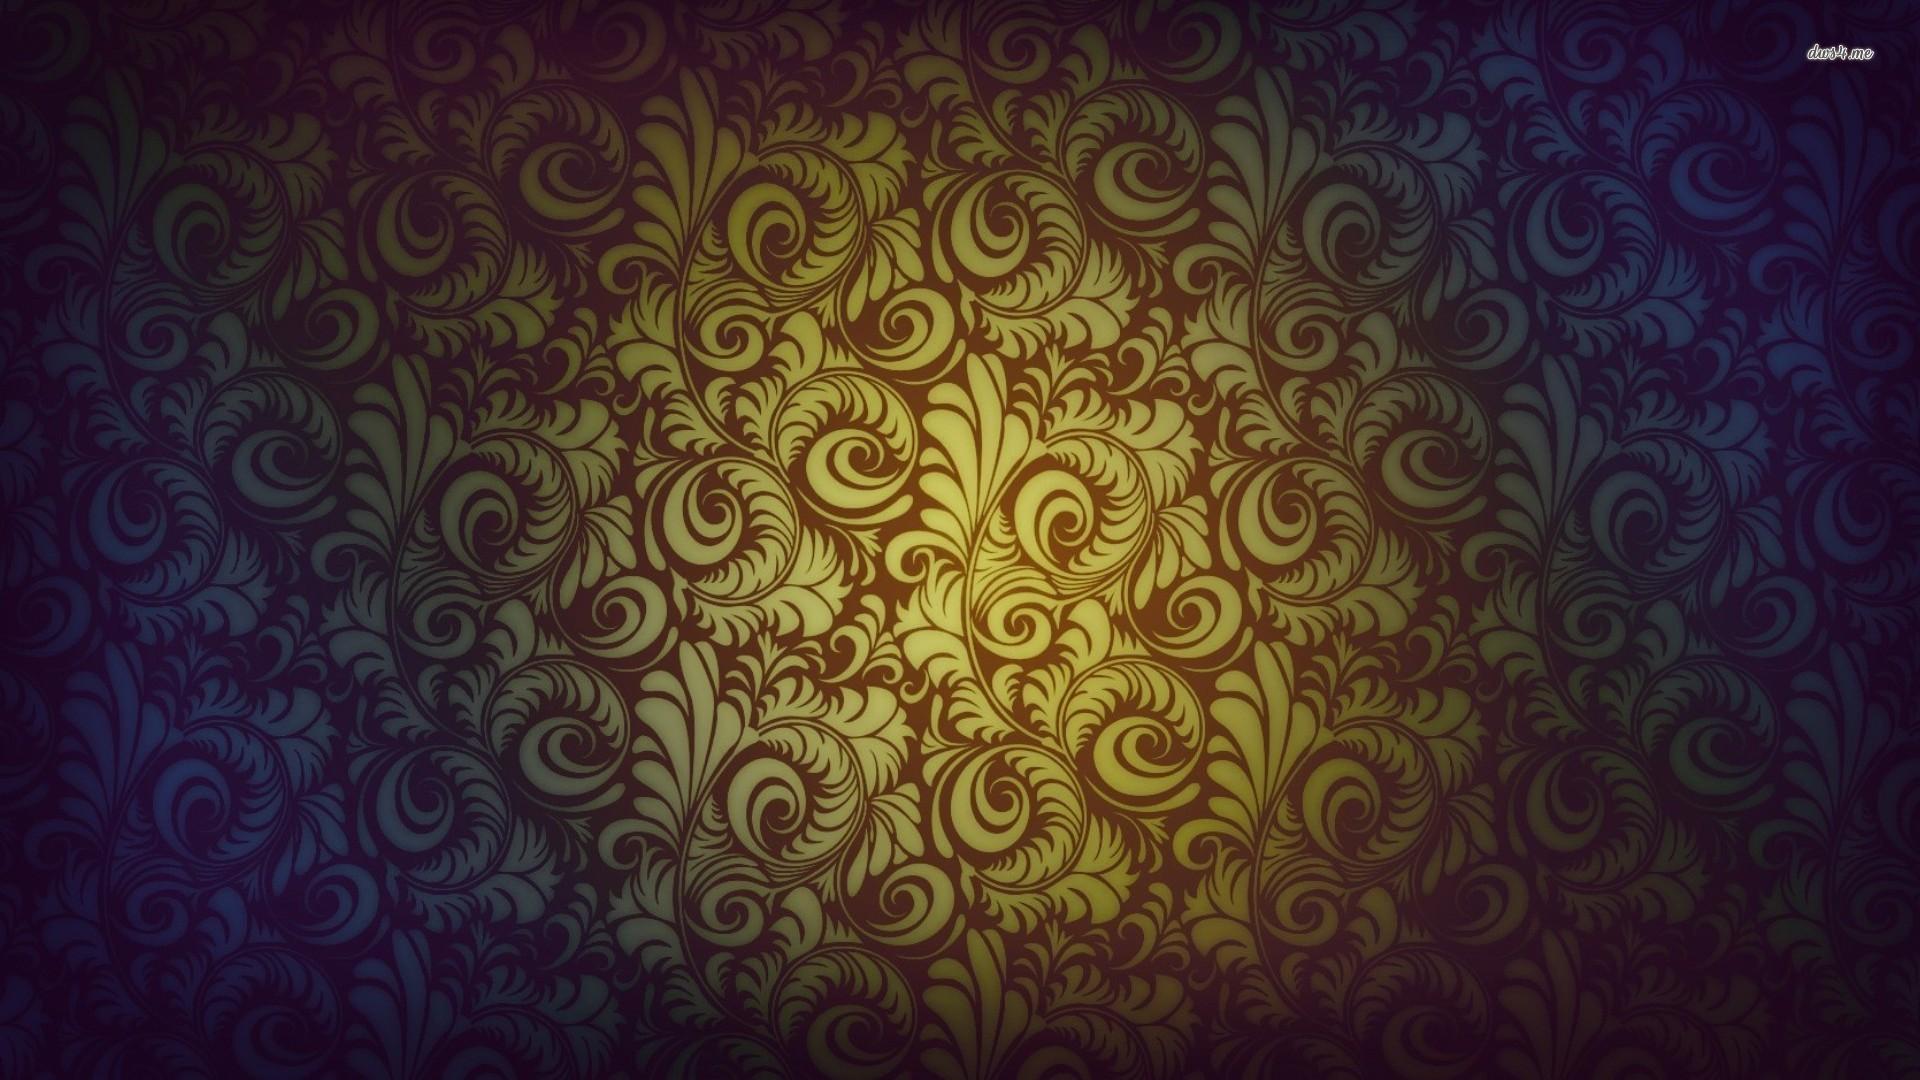 14597-paisley-pattern-1920x1080-abstract-wallpaper.jpg